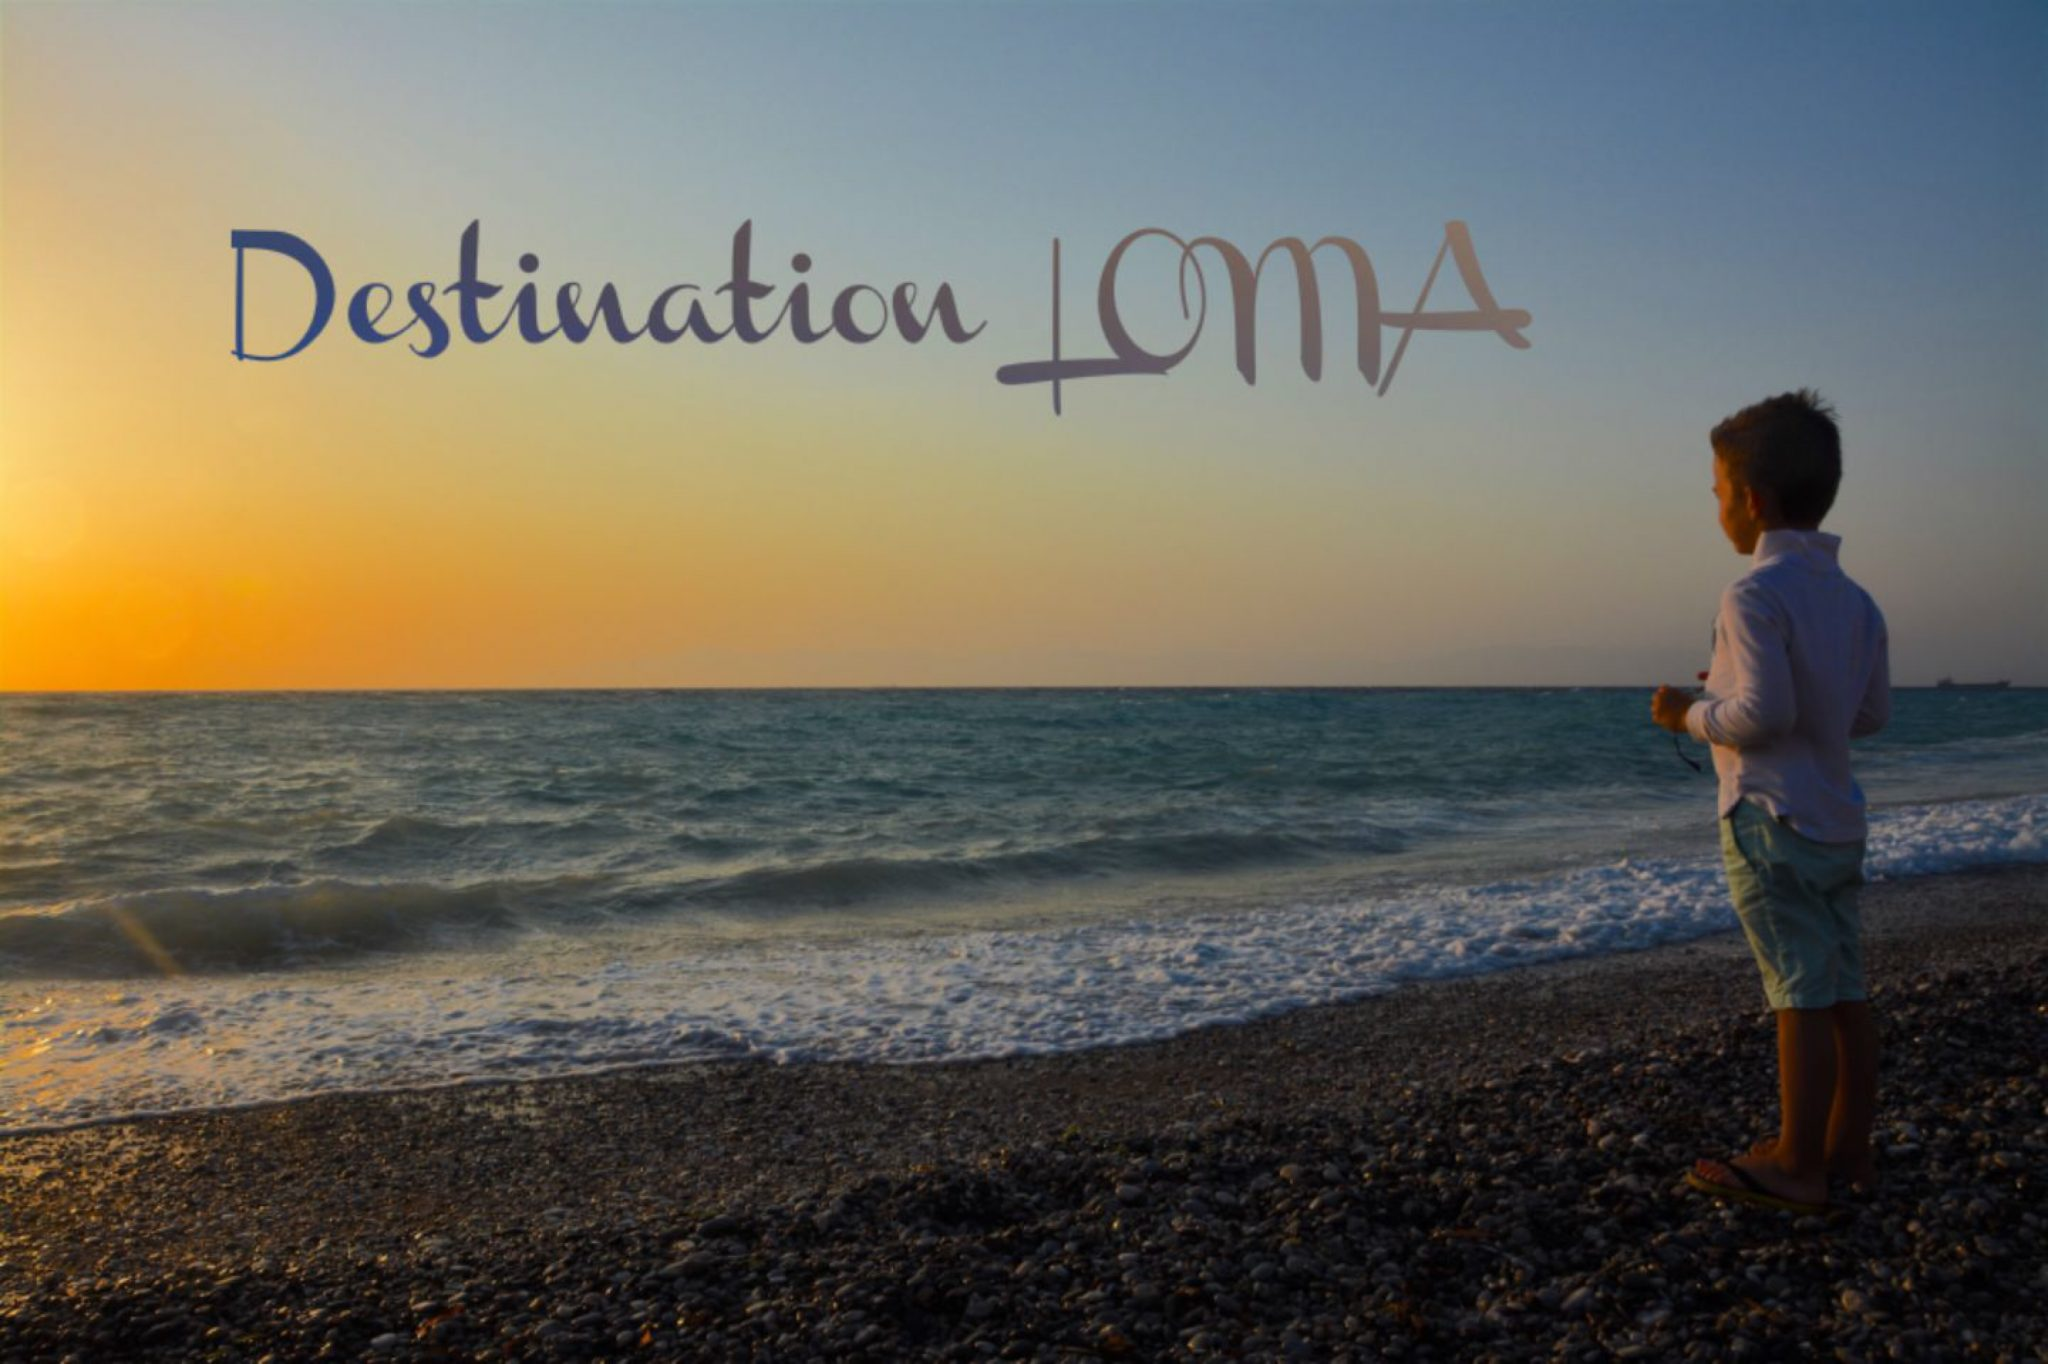 Destination LOMA